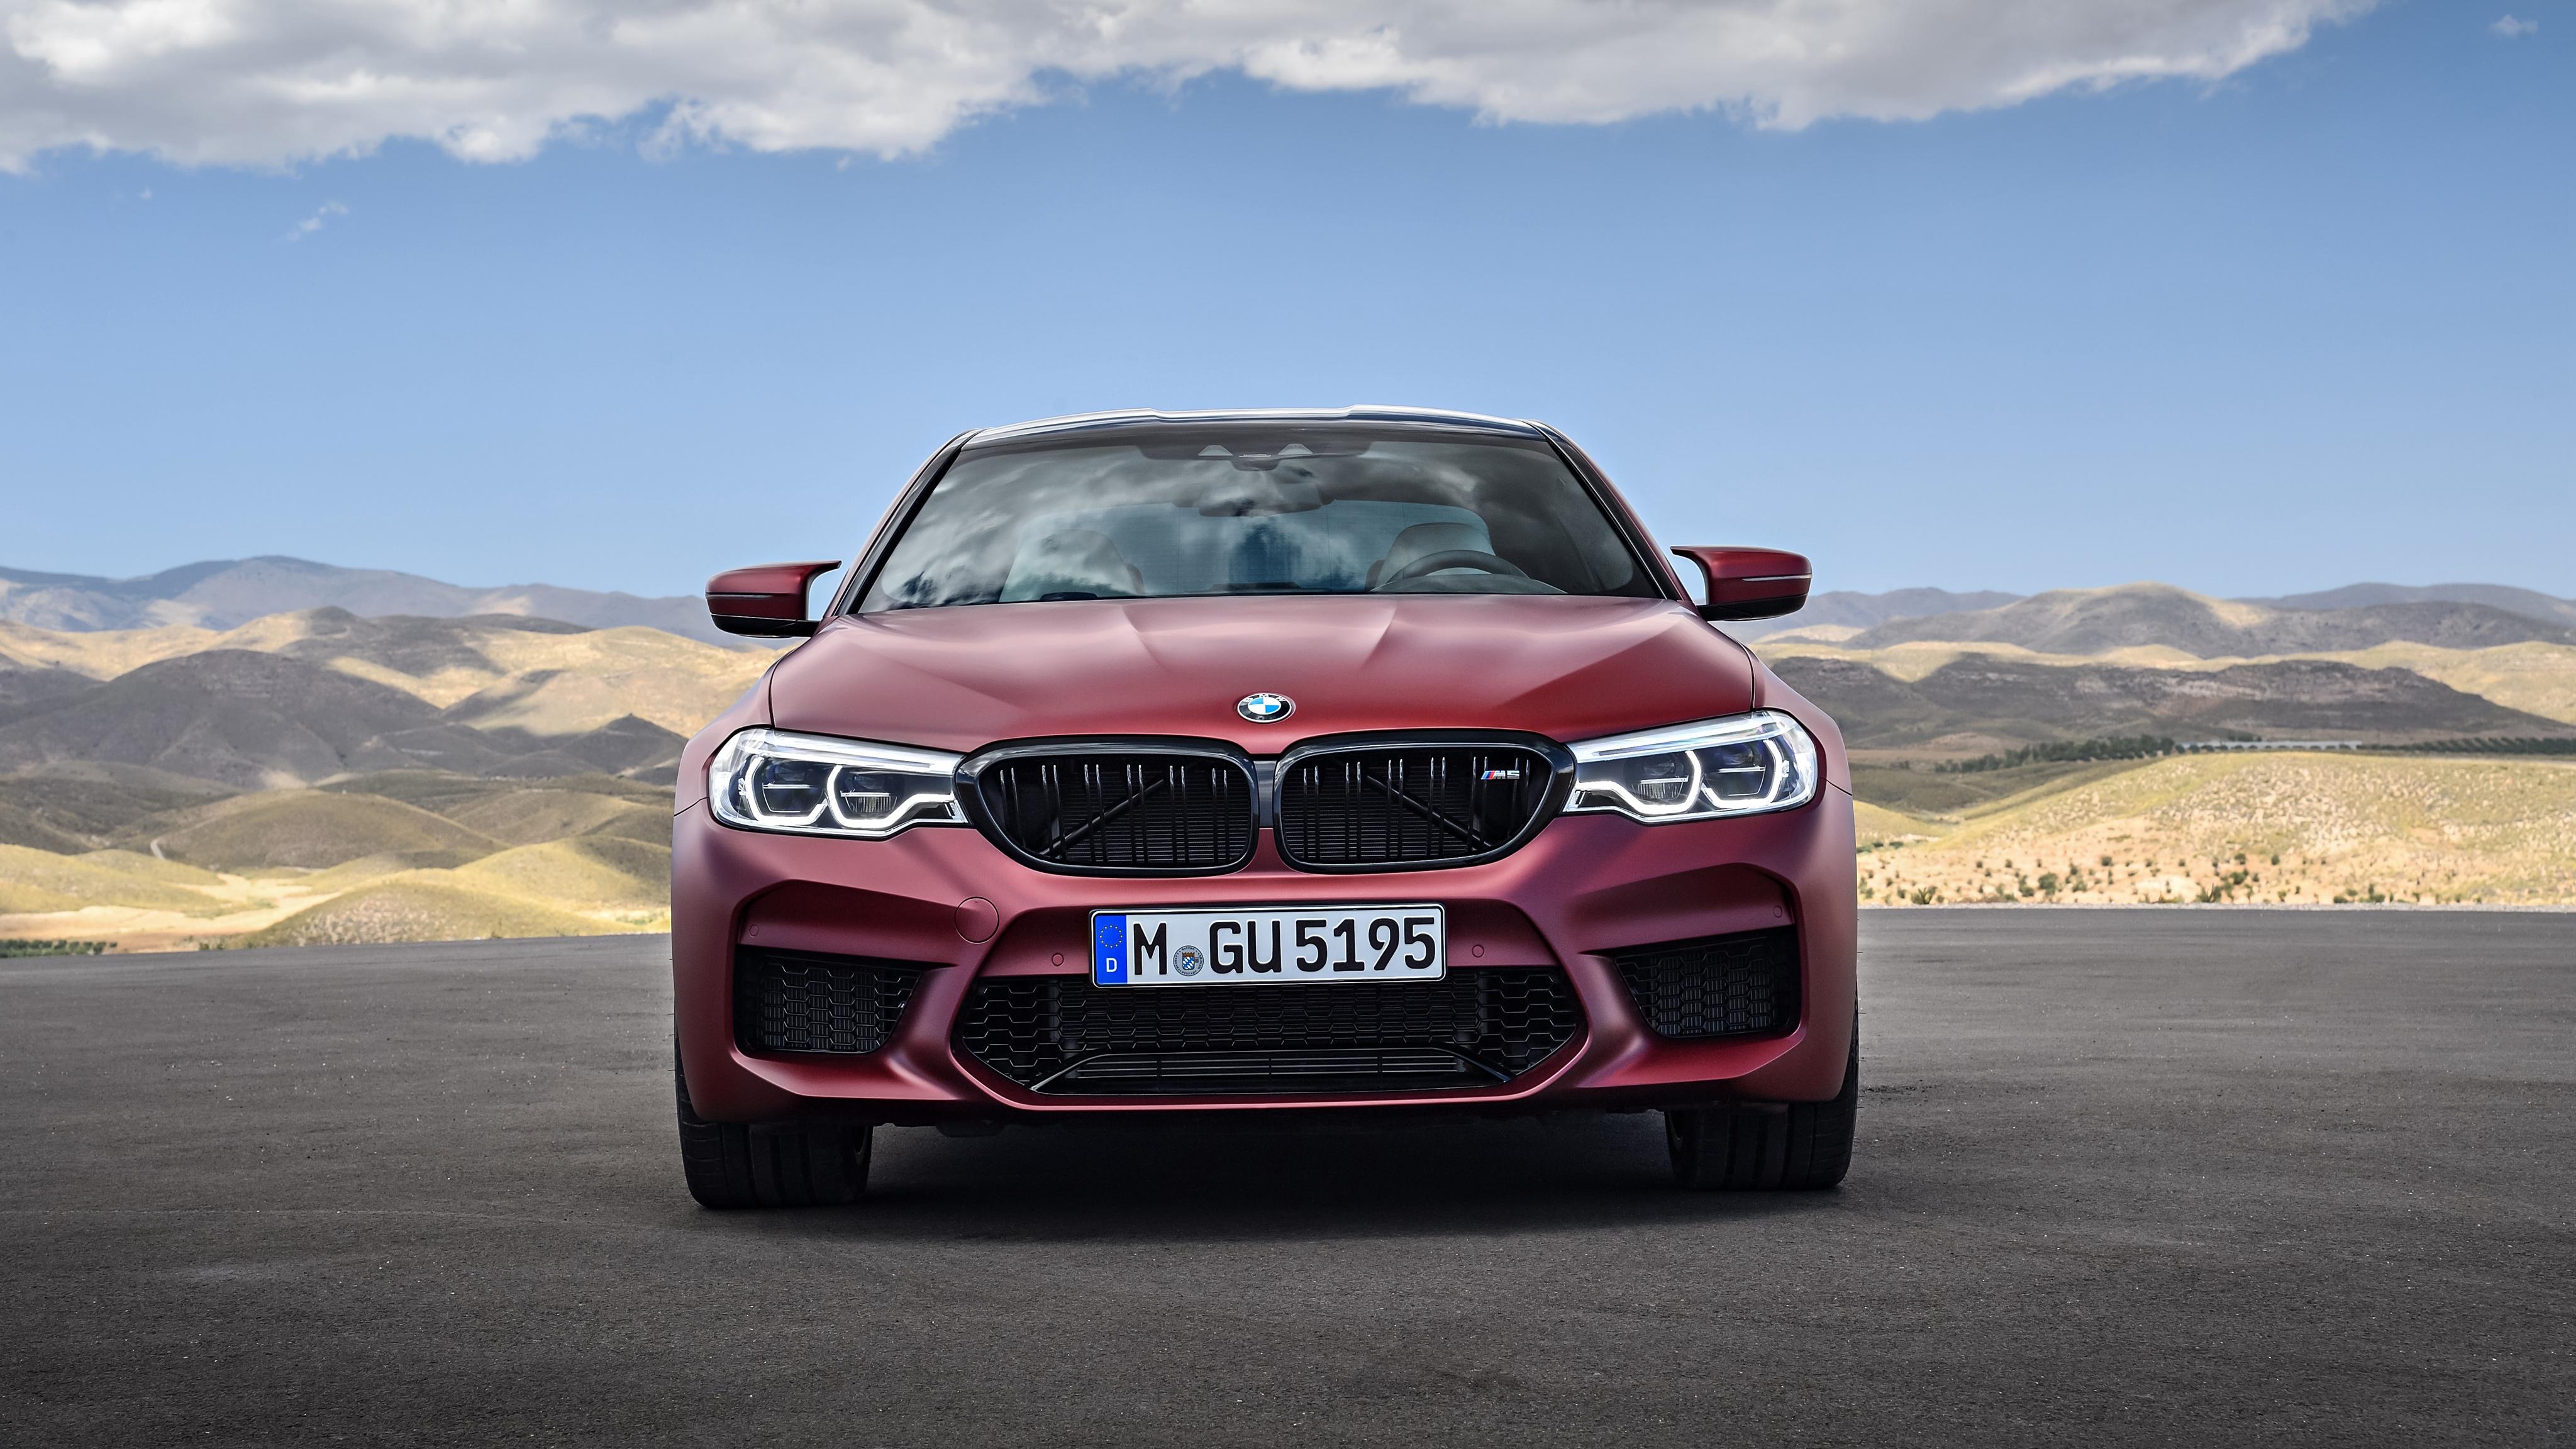 2018 BMW M5 First Edition 4K Wallpaper HD Car Wallpapers ID 8276 4096x2304